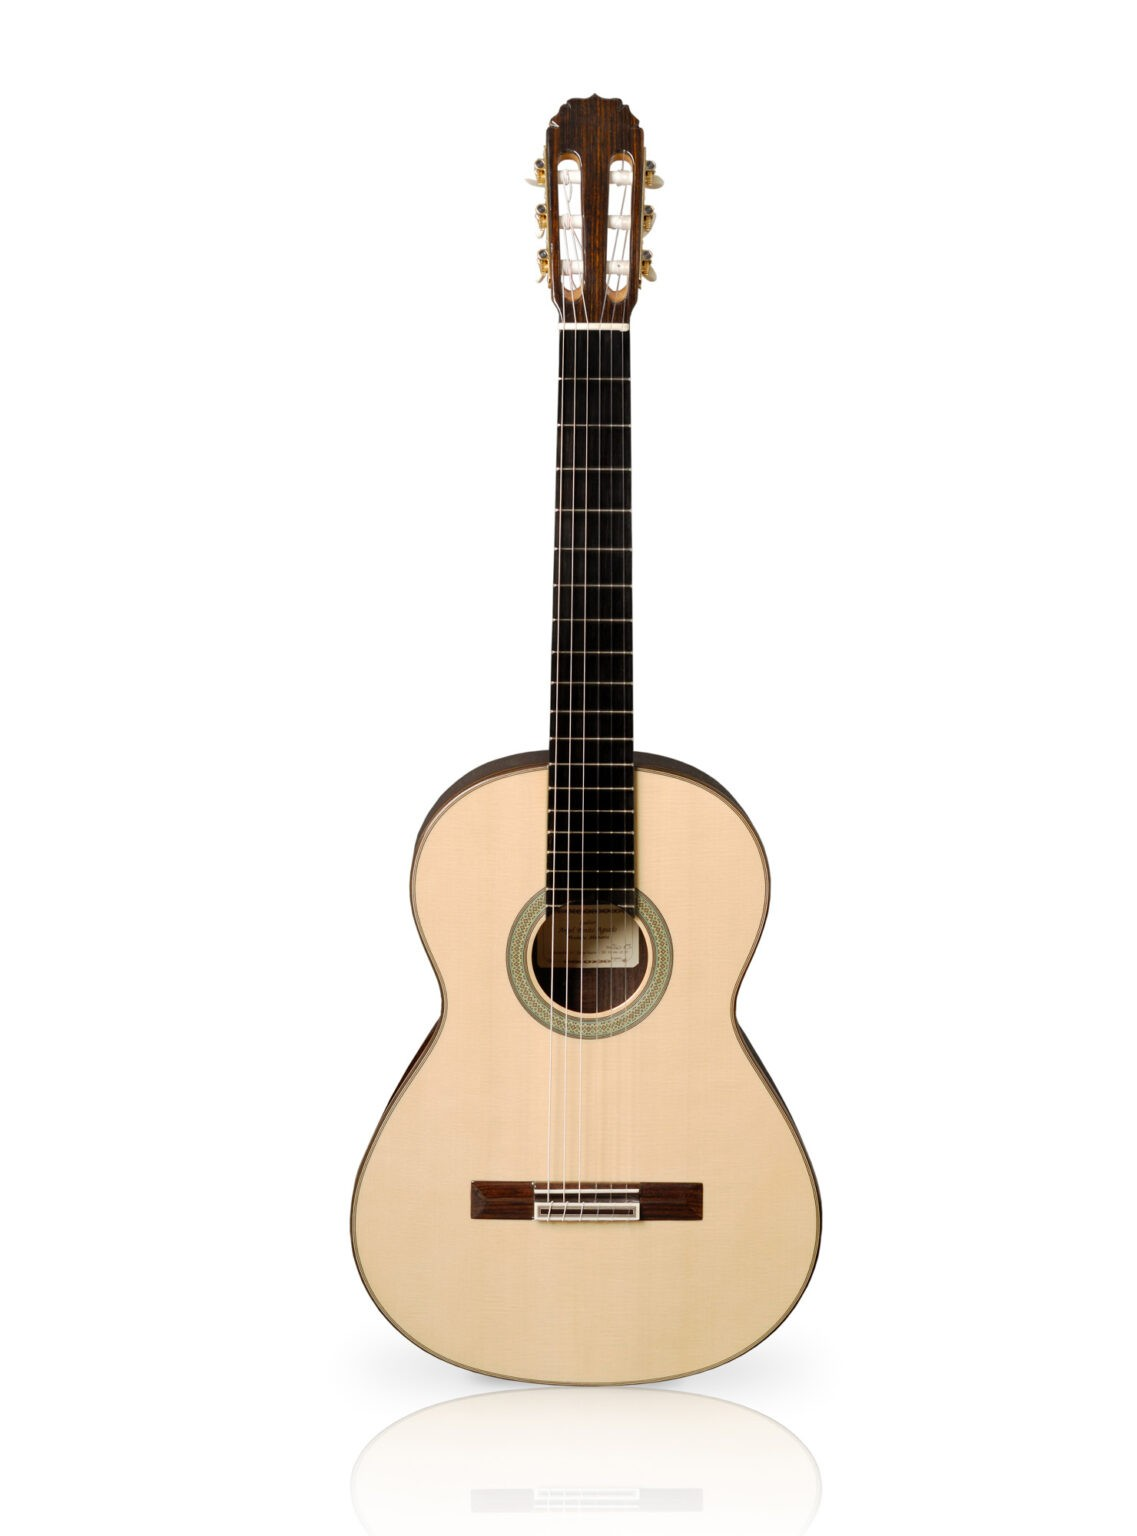 Guitarras de Angel Benito Aguado - Guitarras de estudio - Marieta